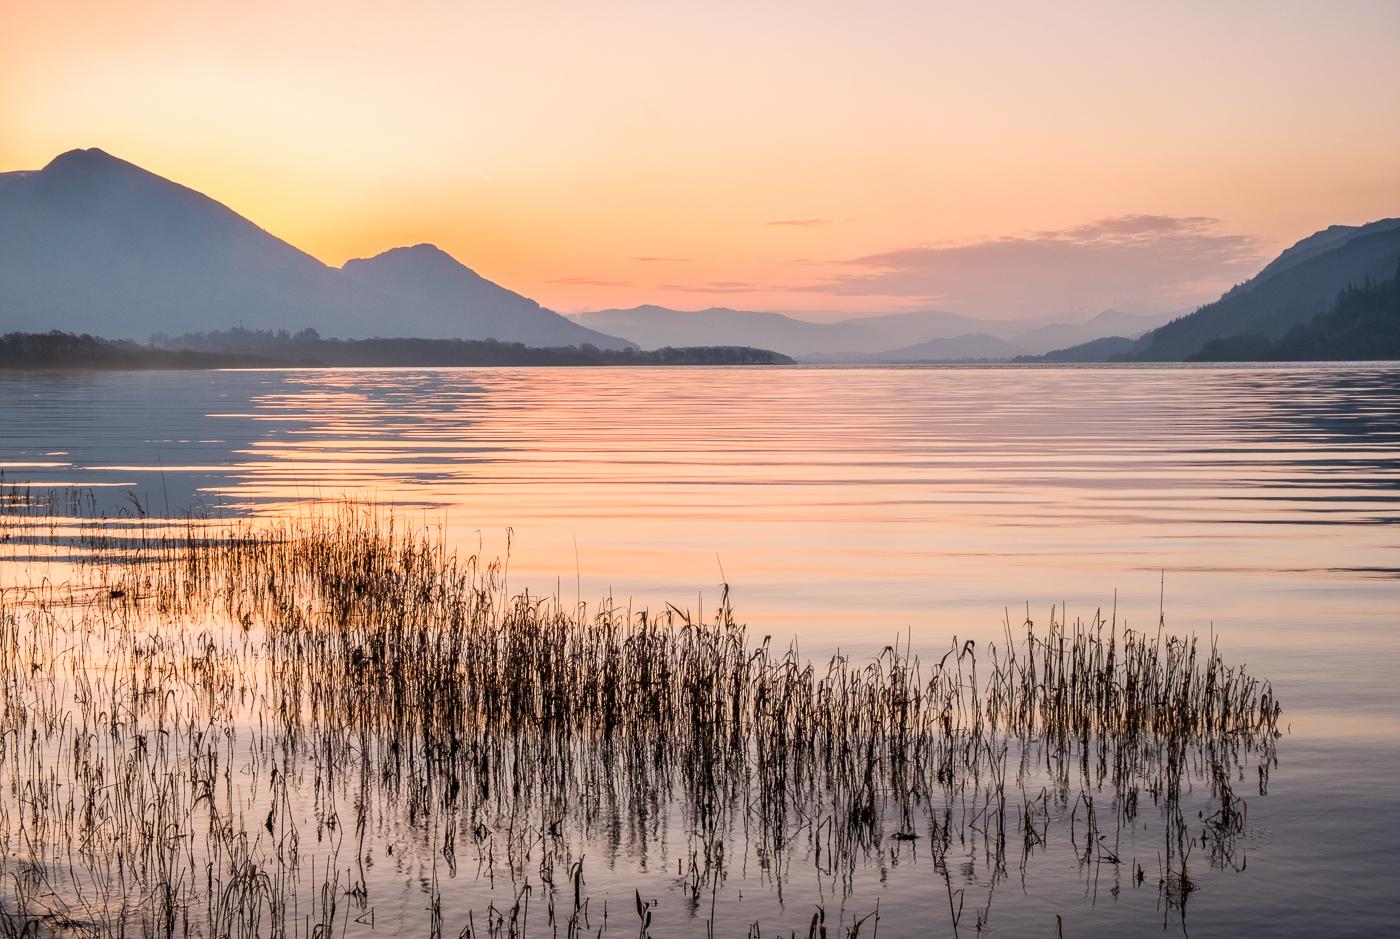 Reed, John_Bassenthwaite Dawn